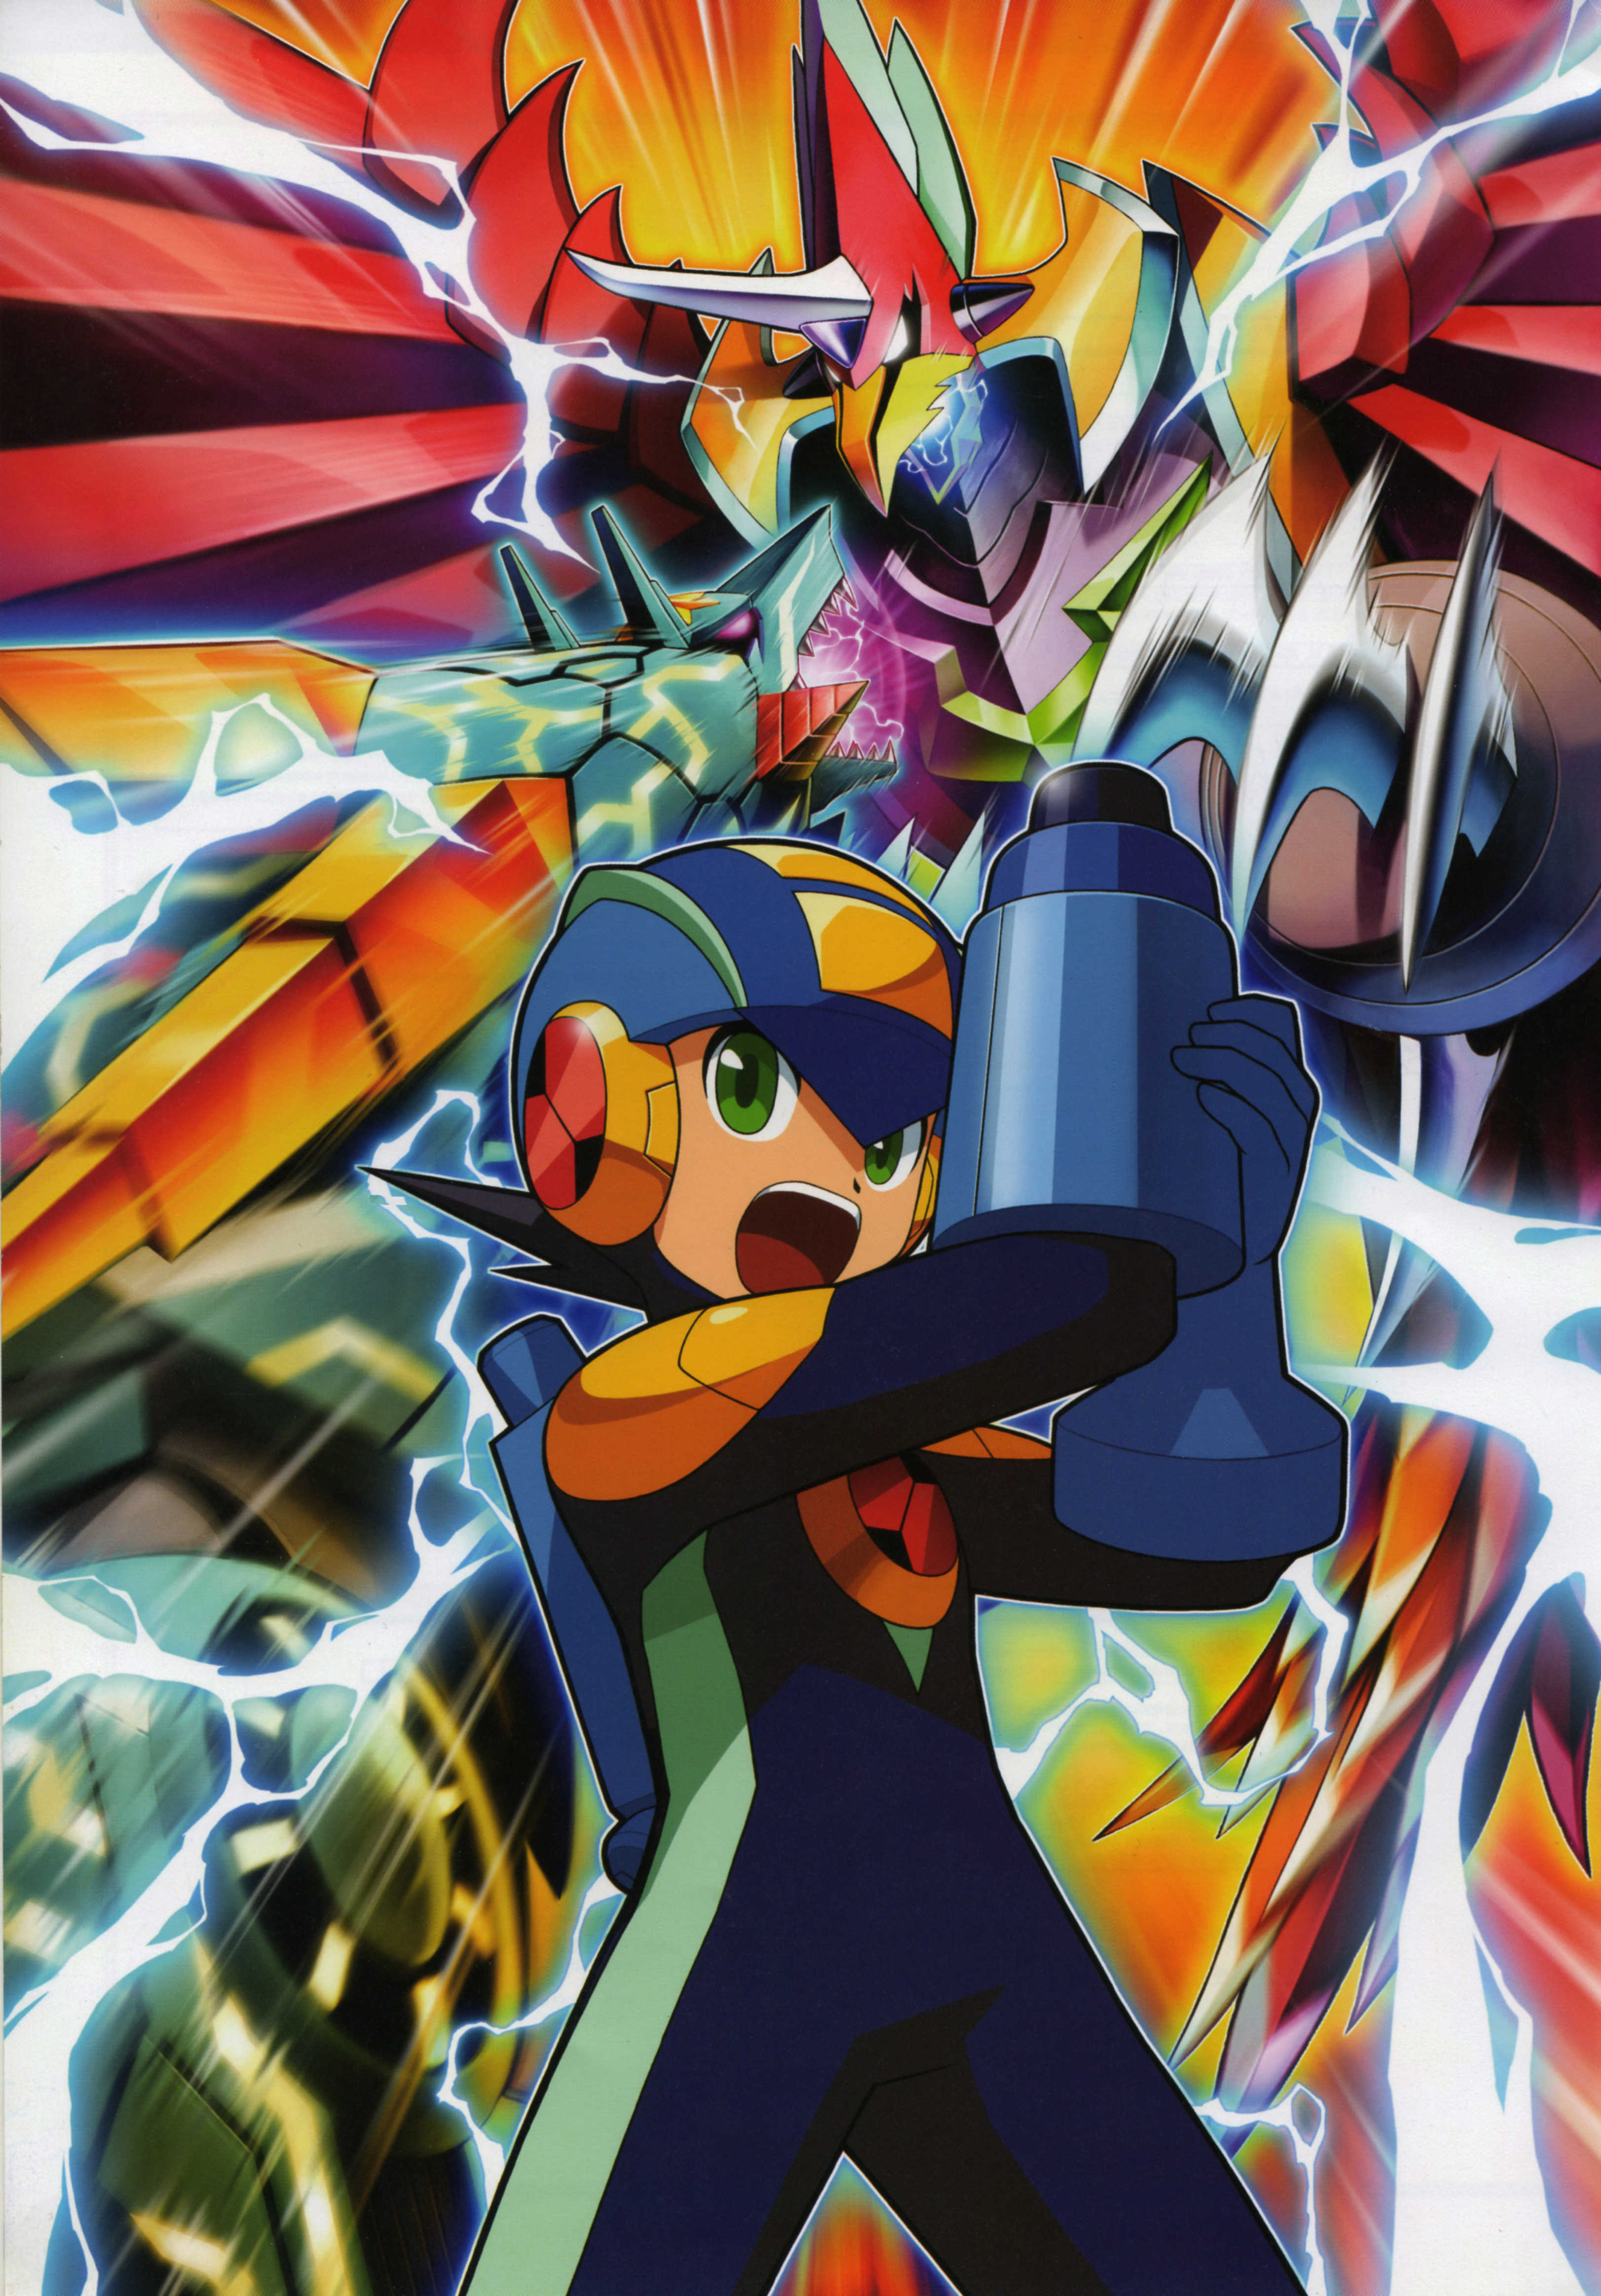 MegaMan NT Warrior, Vol. 8 | Book by Ryo Takamisaki